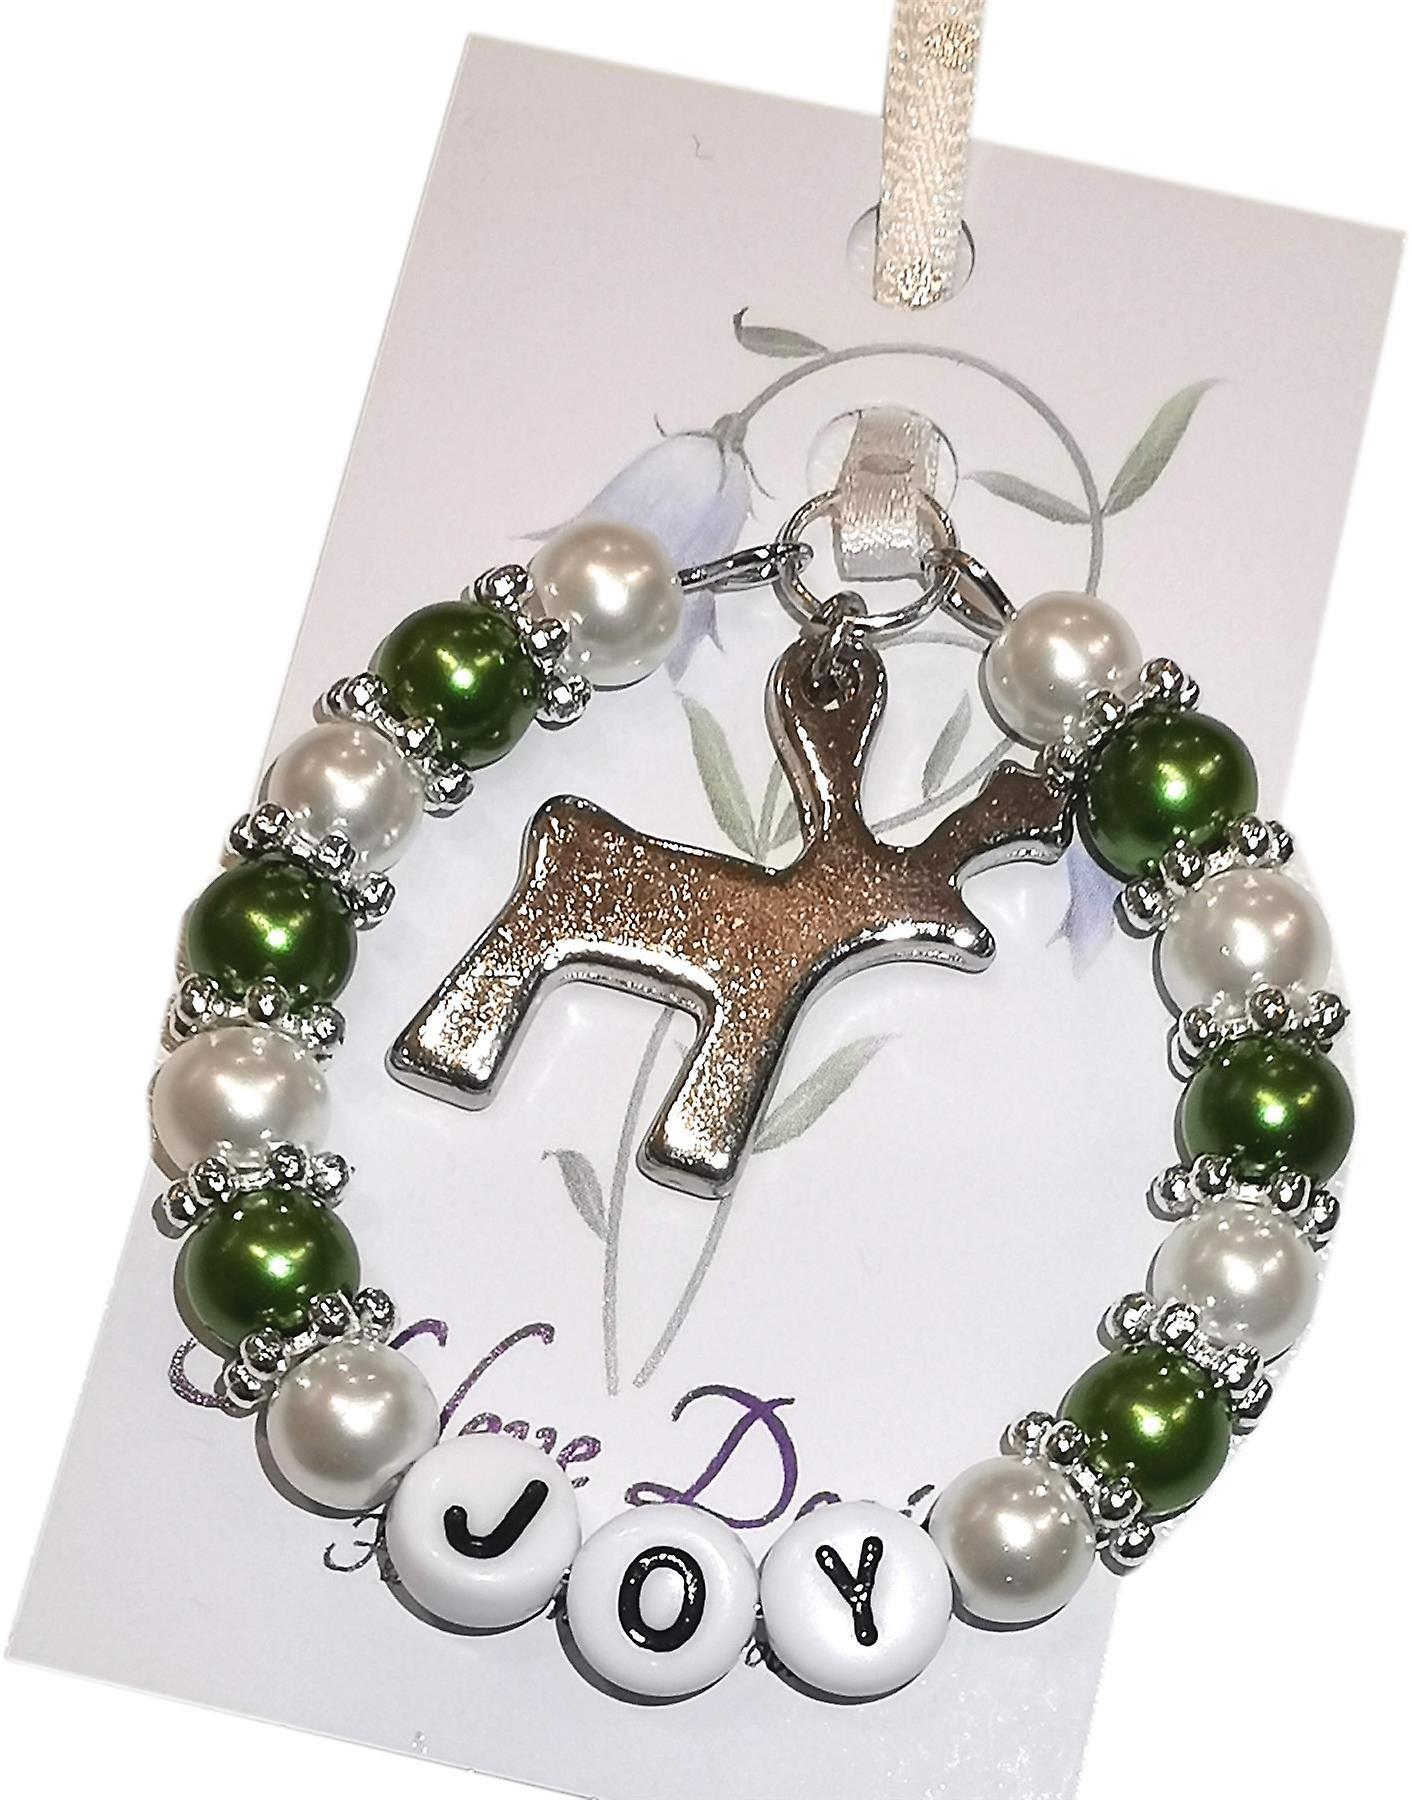 Nyleve Designs handmade Christmas Keepsake in Green - Joy